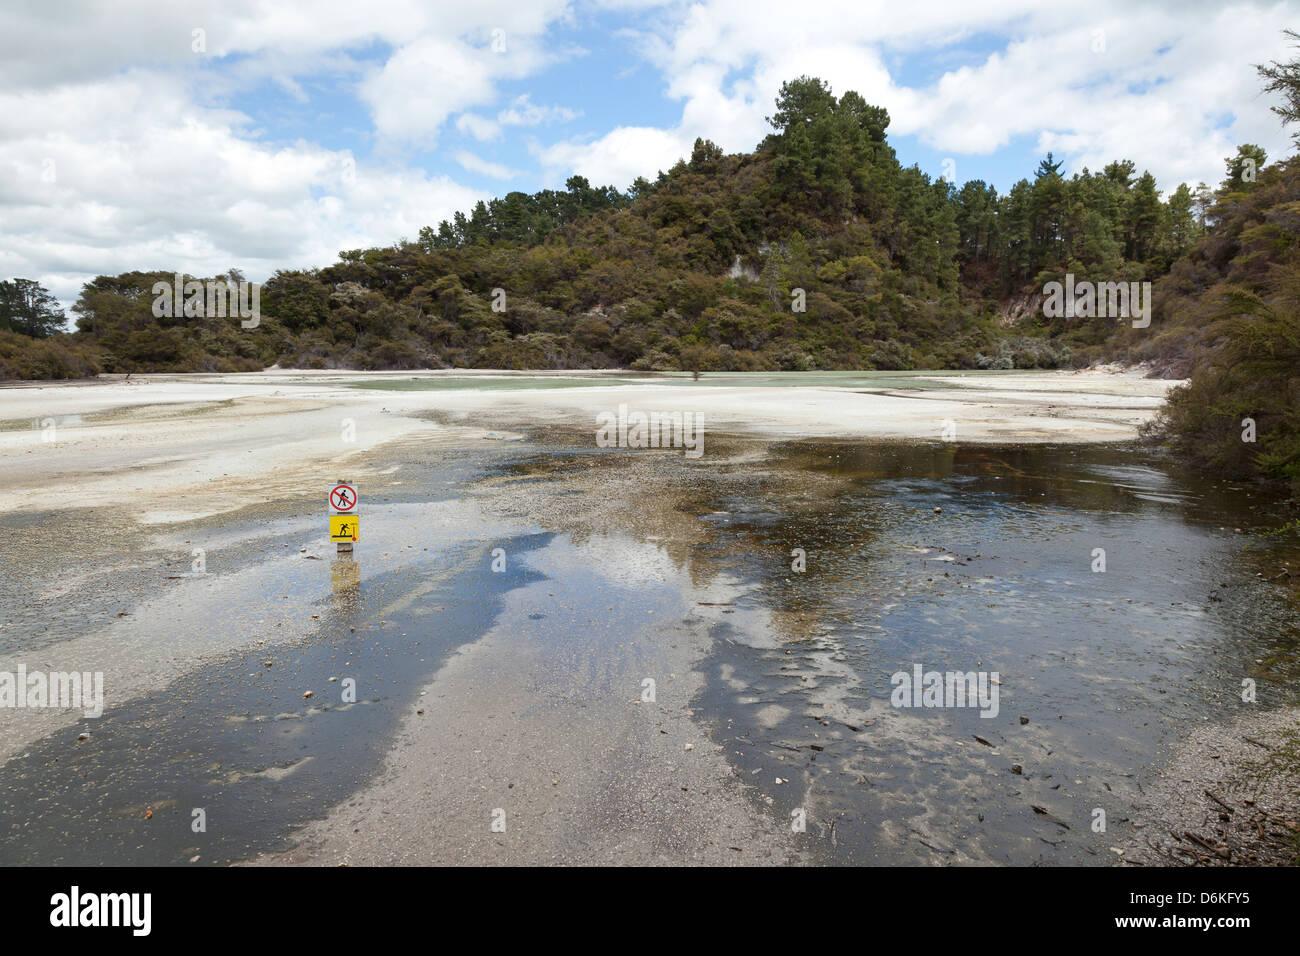 Sartén plana en Wai-O-Tapu Reserva geotermal de Rotorua, Nueva Zelanda Imagen De Stock